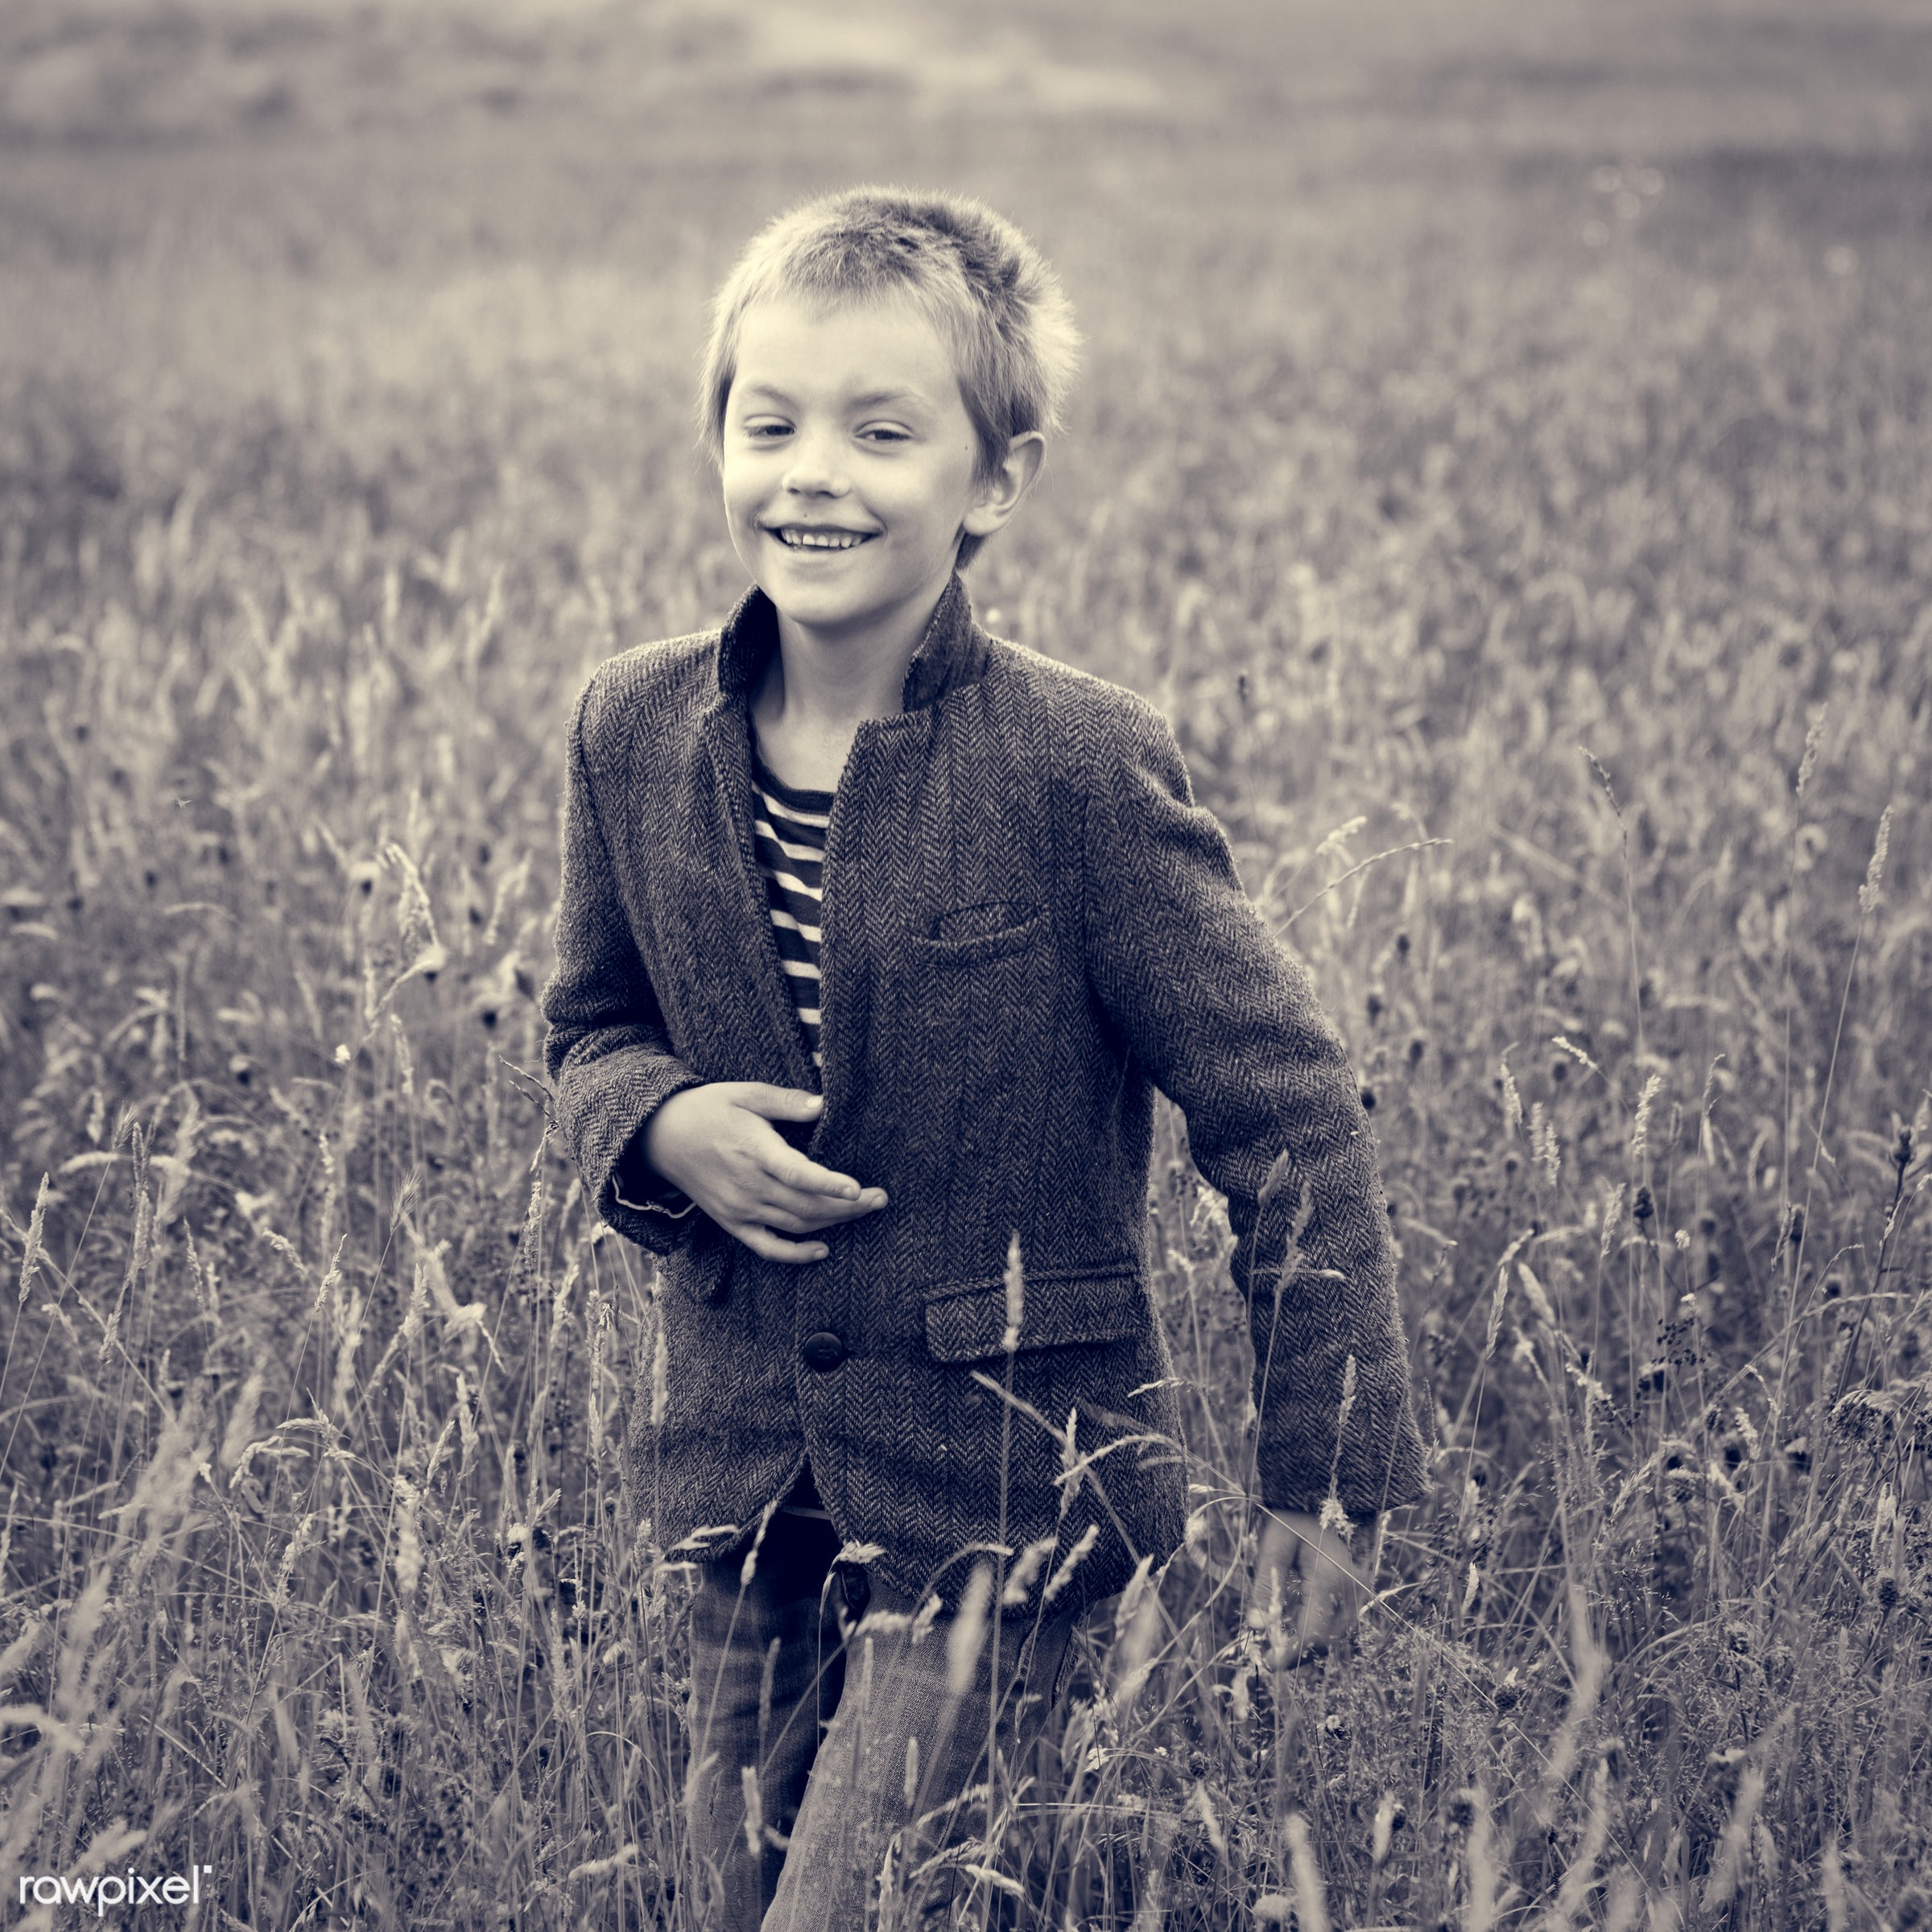 boy, cheerful, child, childhood, enjoyment, environment, environmental, field, fresh, freshness, fun, garden, grass,...